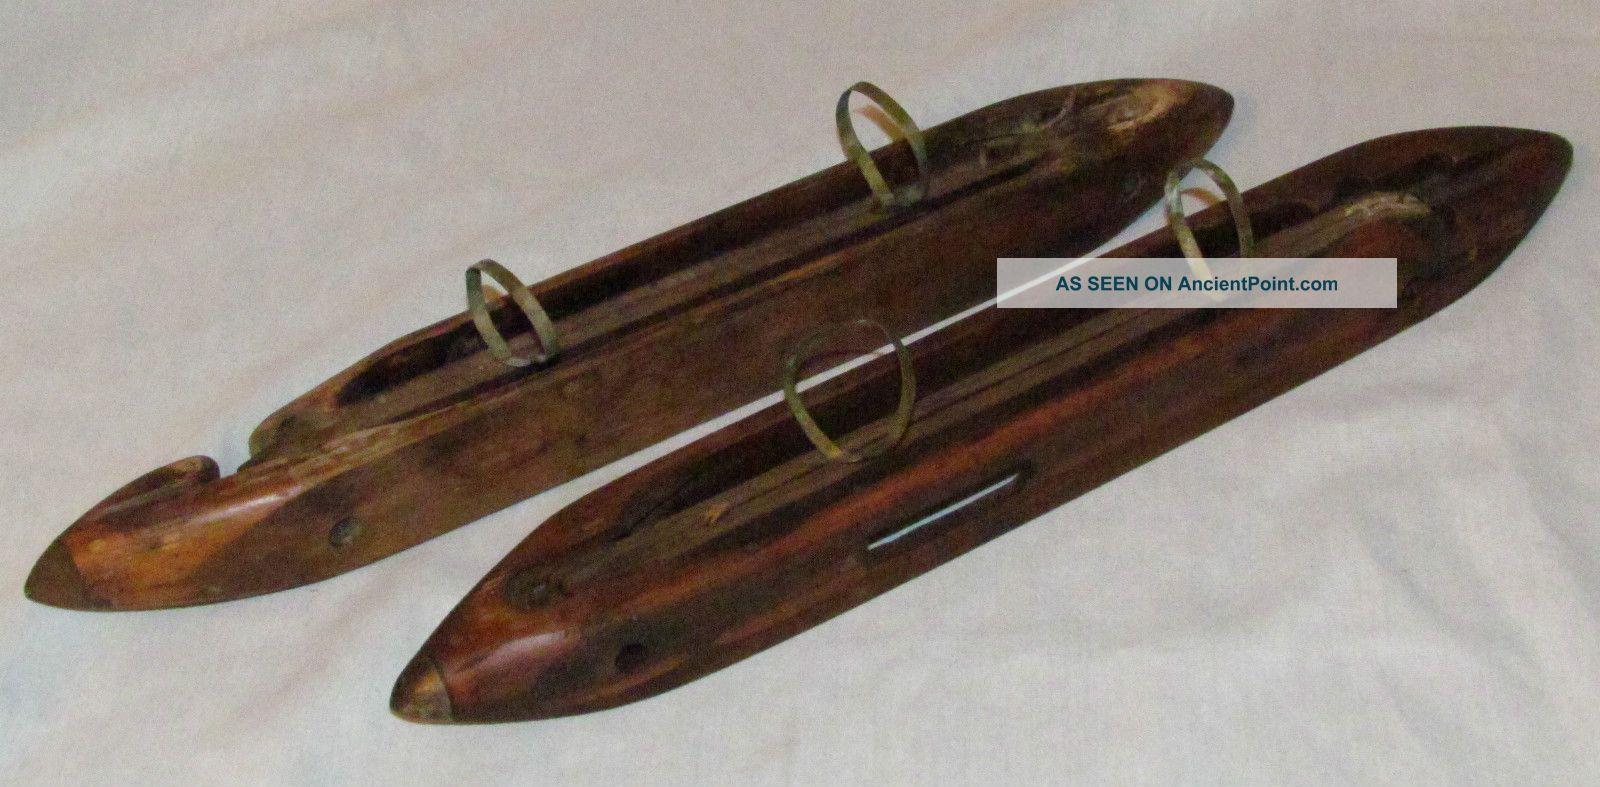 2 Antique Vtg Wood Loom Long Boat Shuttle Tool Bobbin Bsb Wrkshop Watson William Tools, Scissors & Measures photo